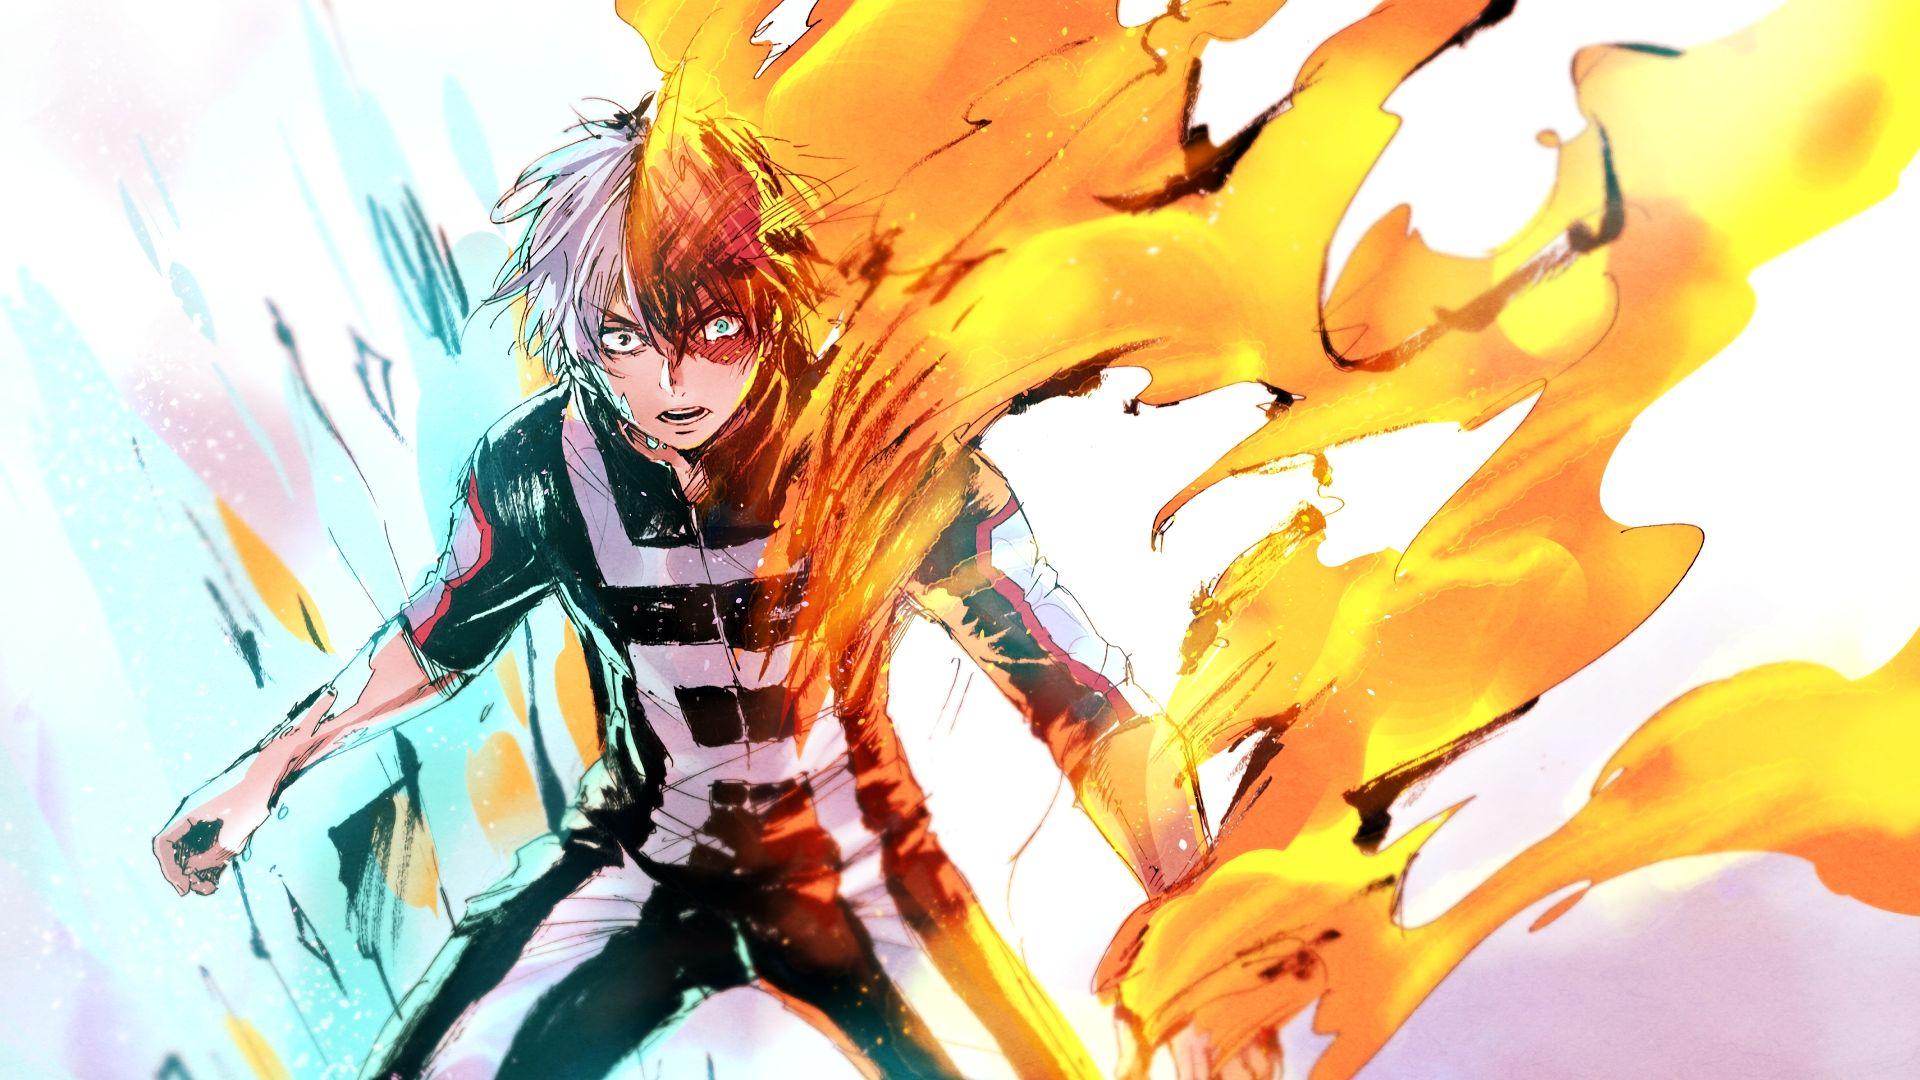 Wallpaper Angry, fight, Shouto Todoroki, anime boy